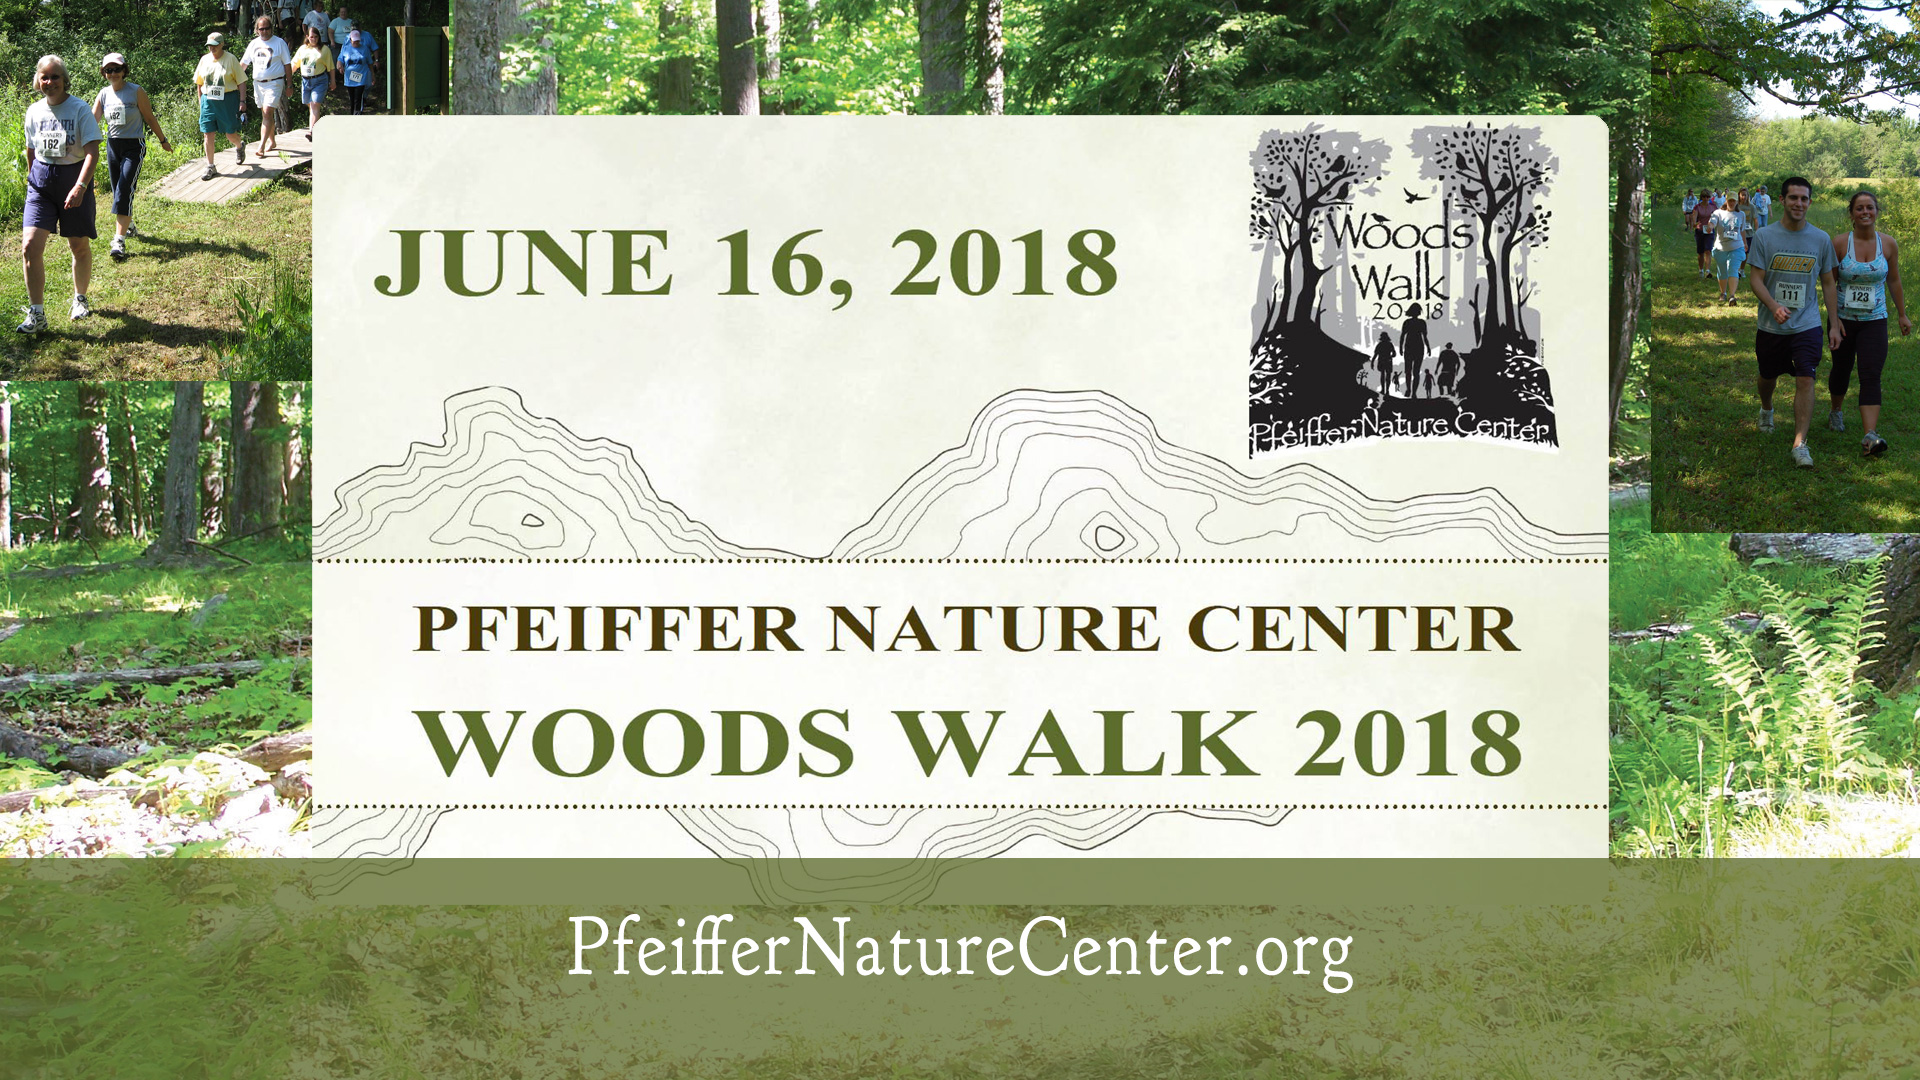 Pfeiffer Nature Center's Wood Walk